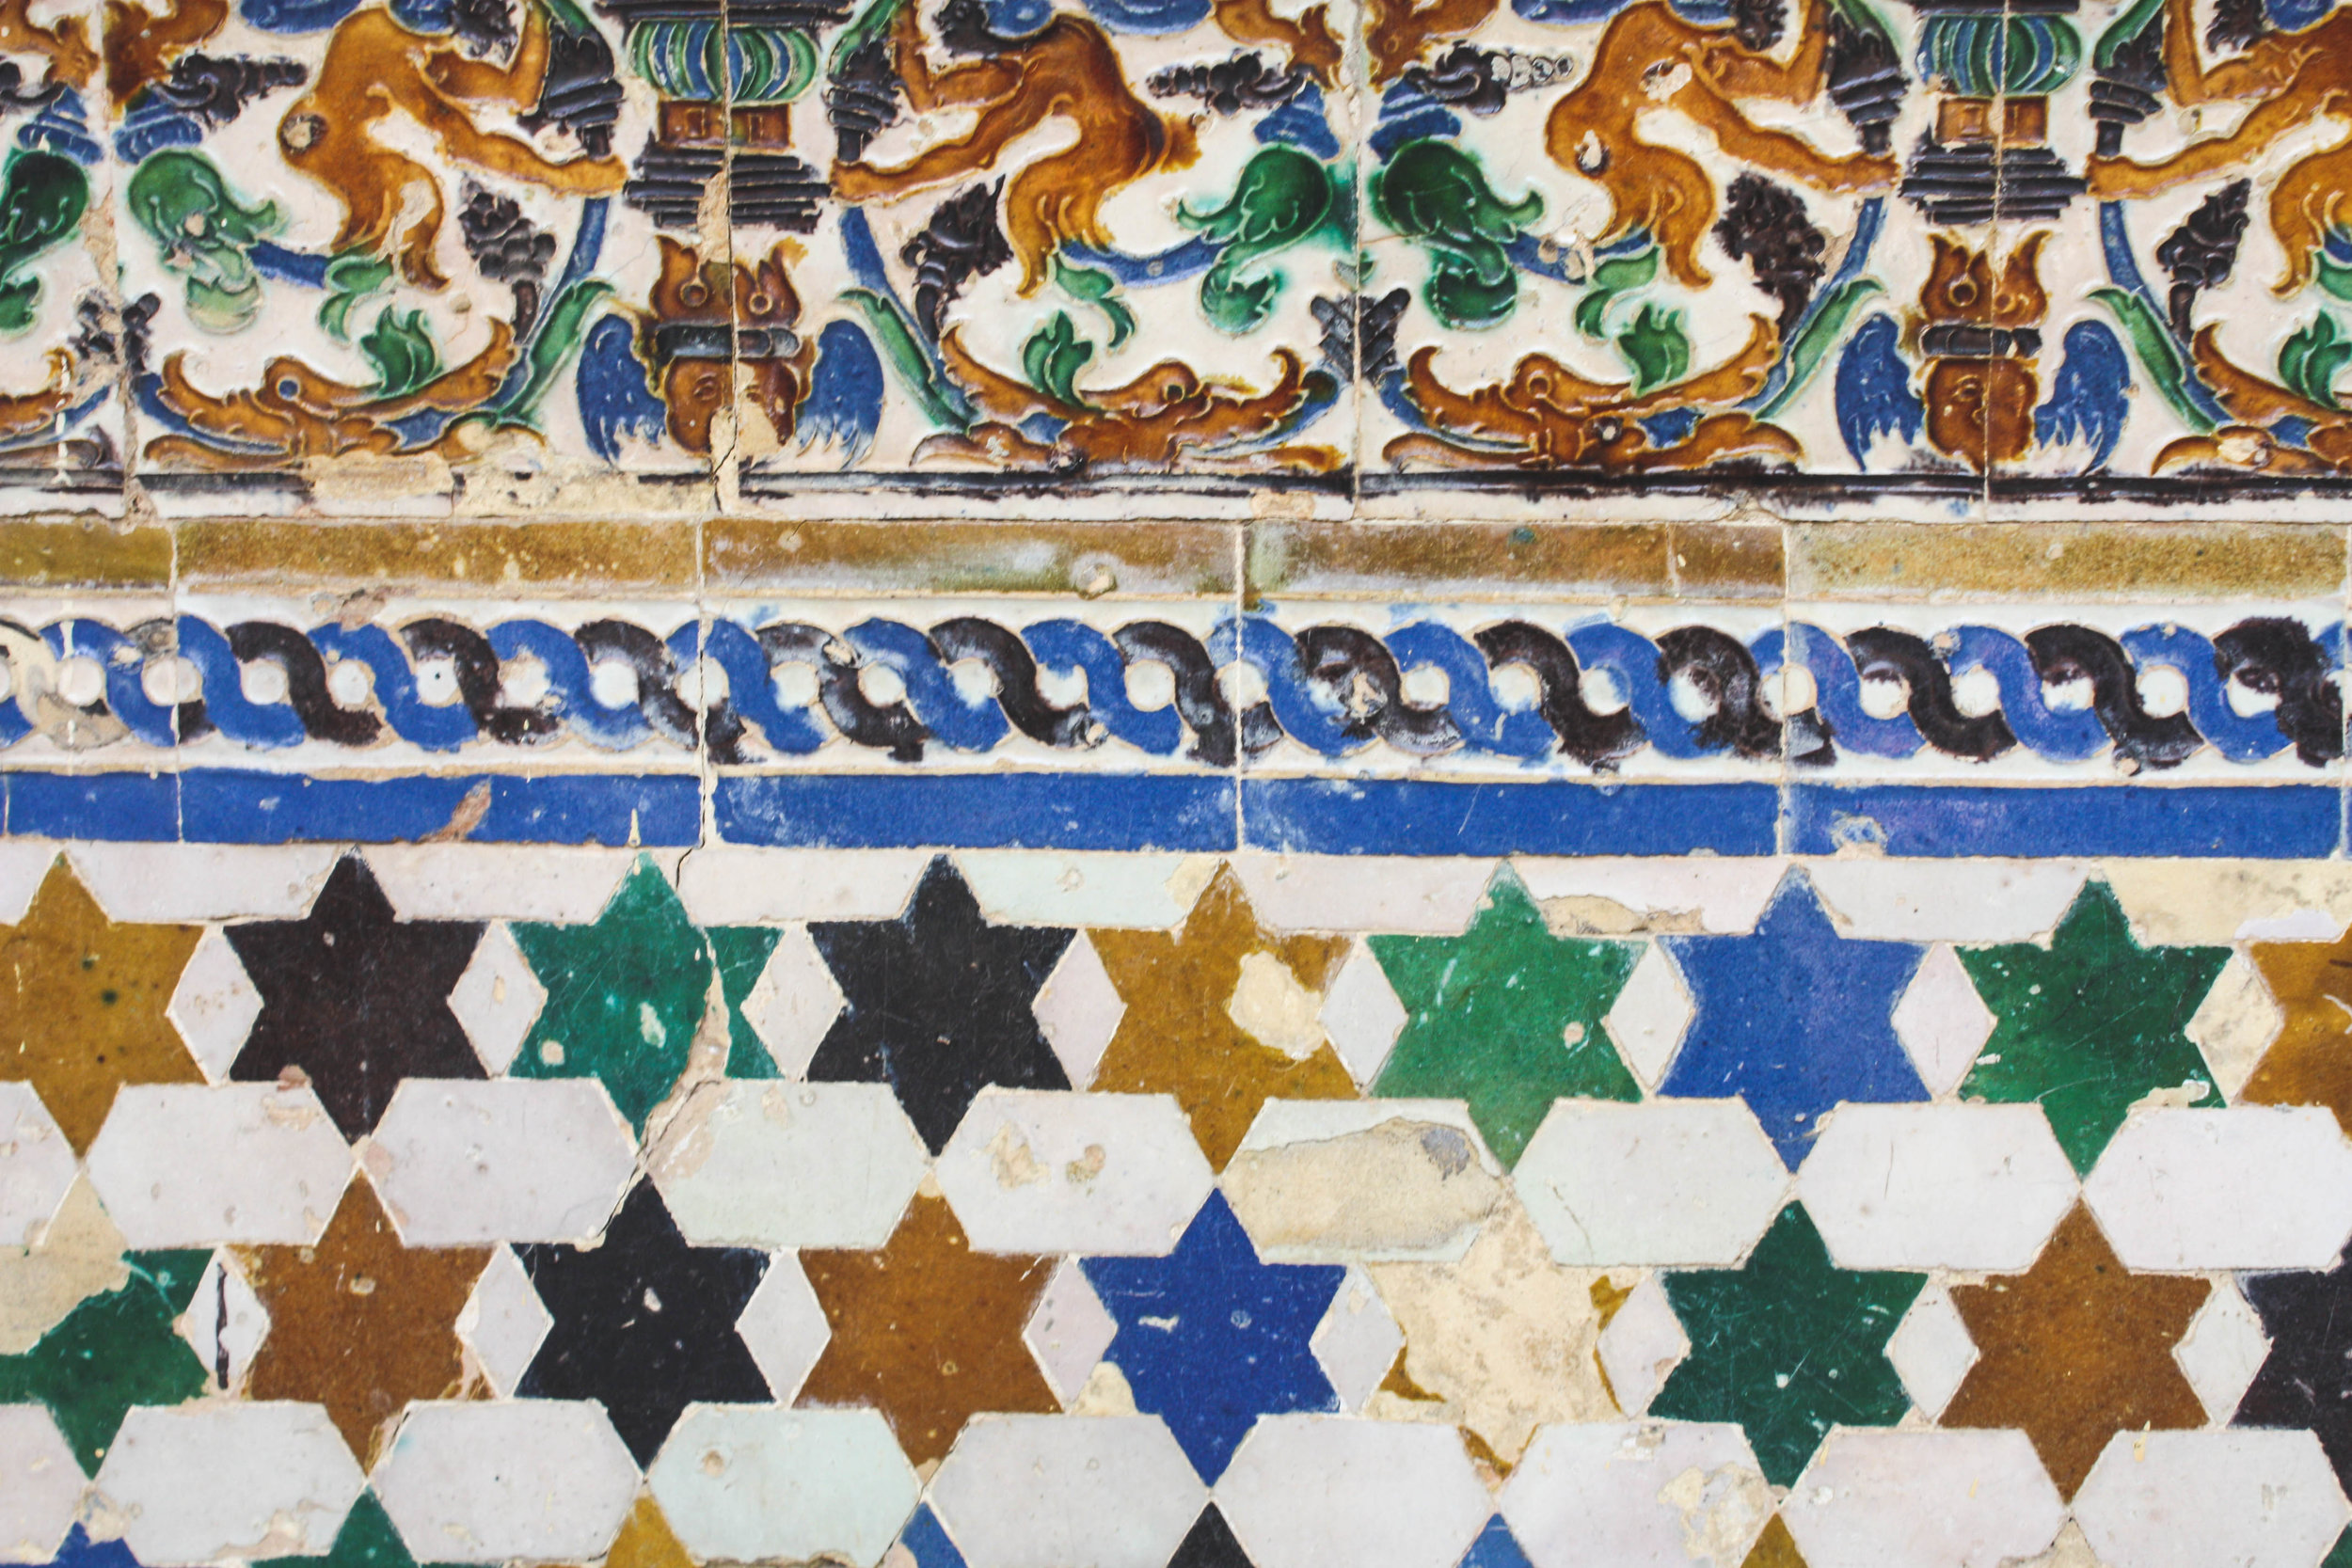 Andalusia - www.haarscherp.be